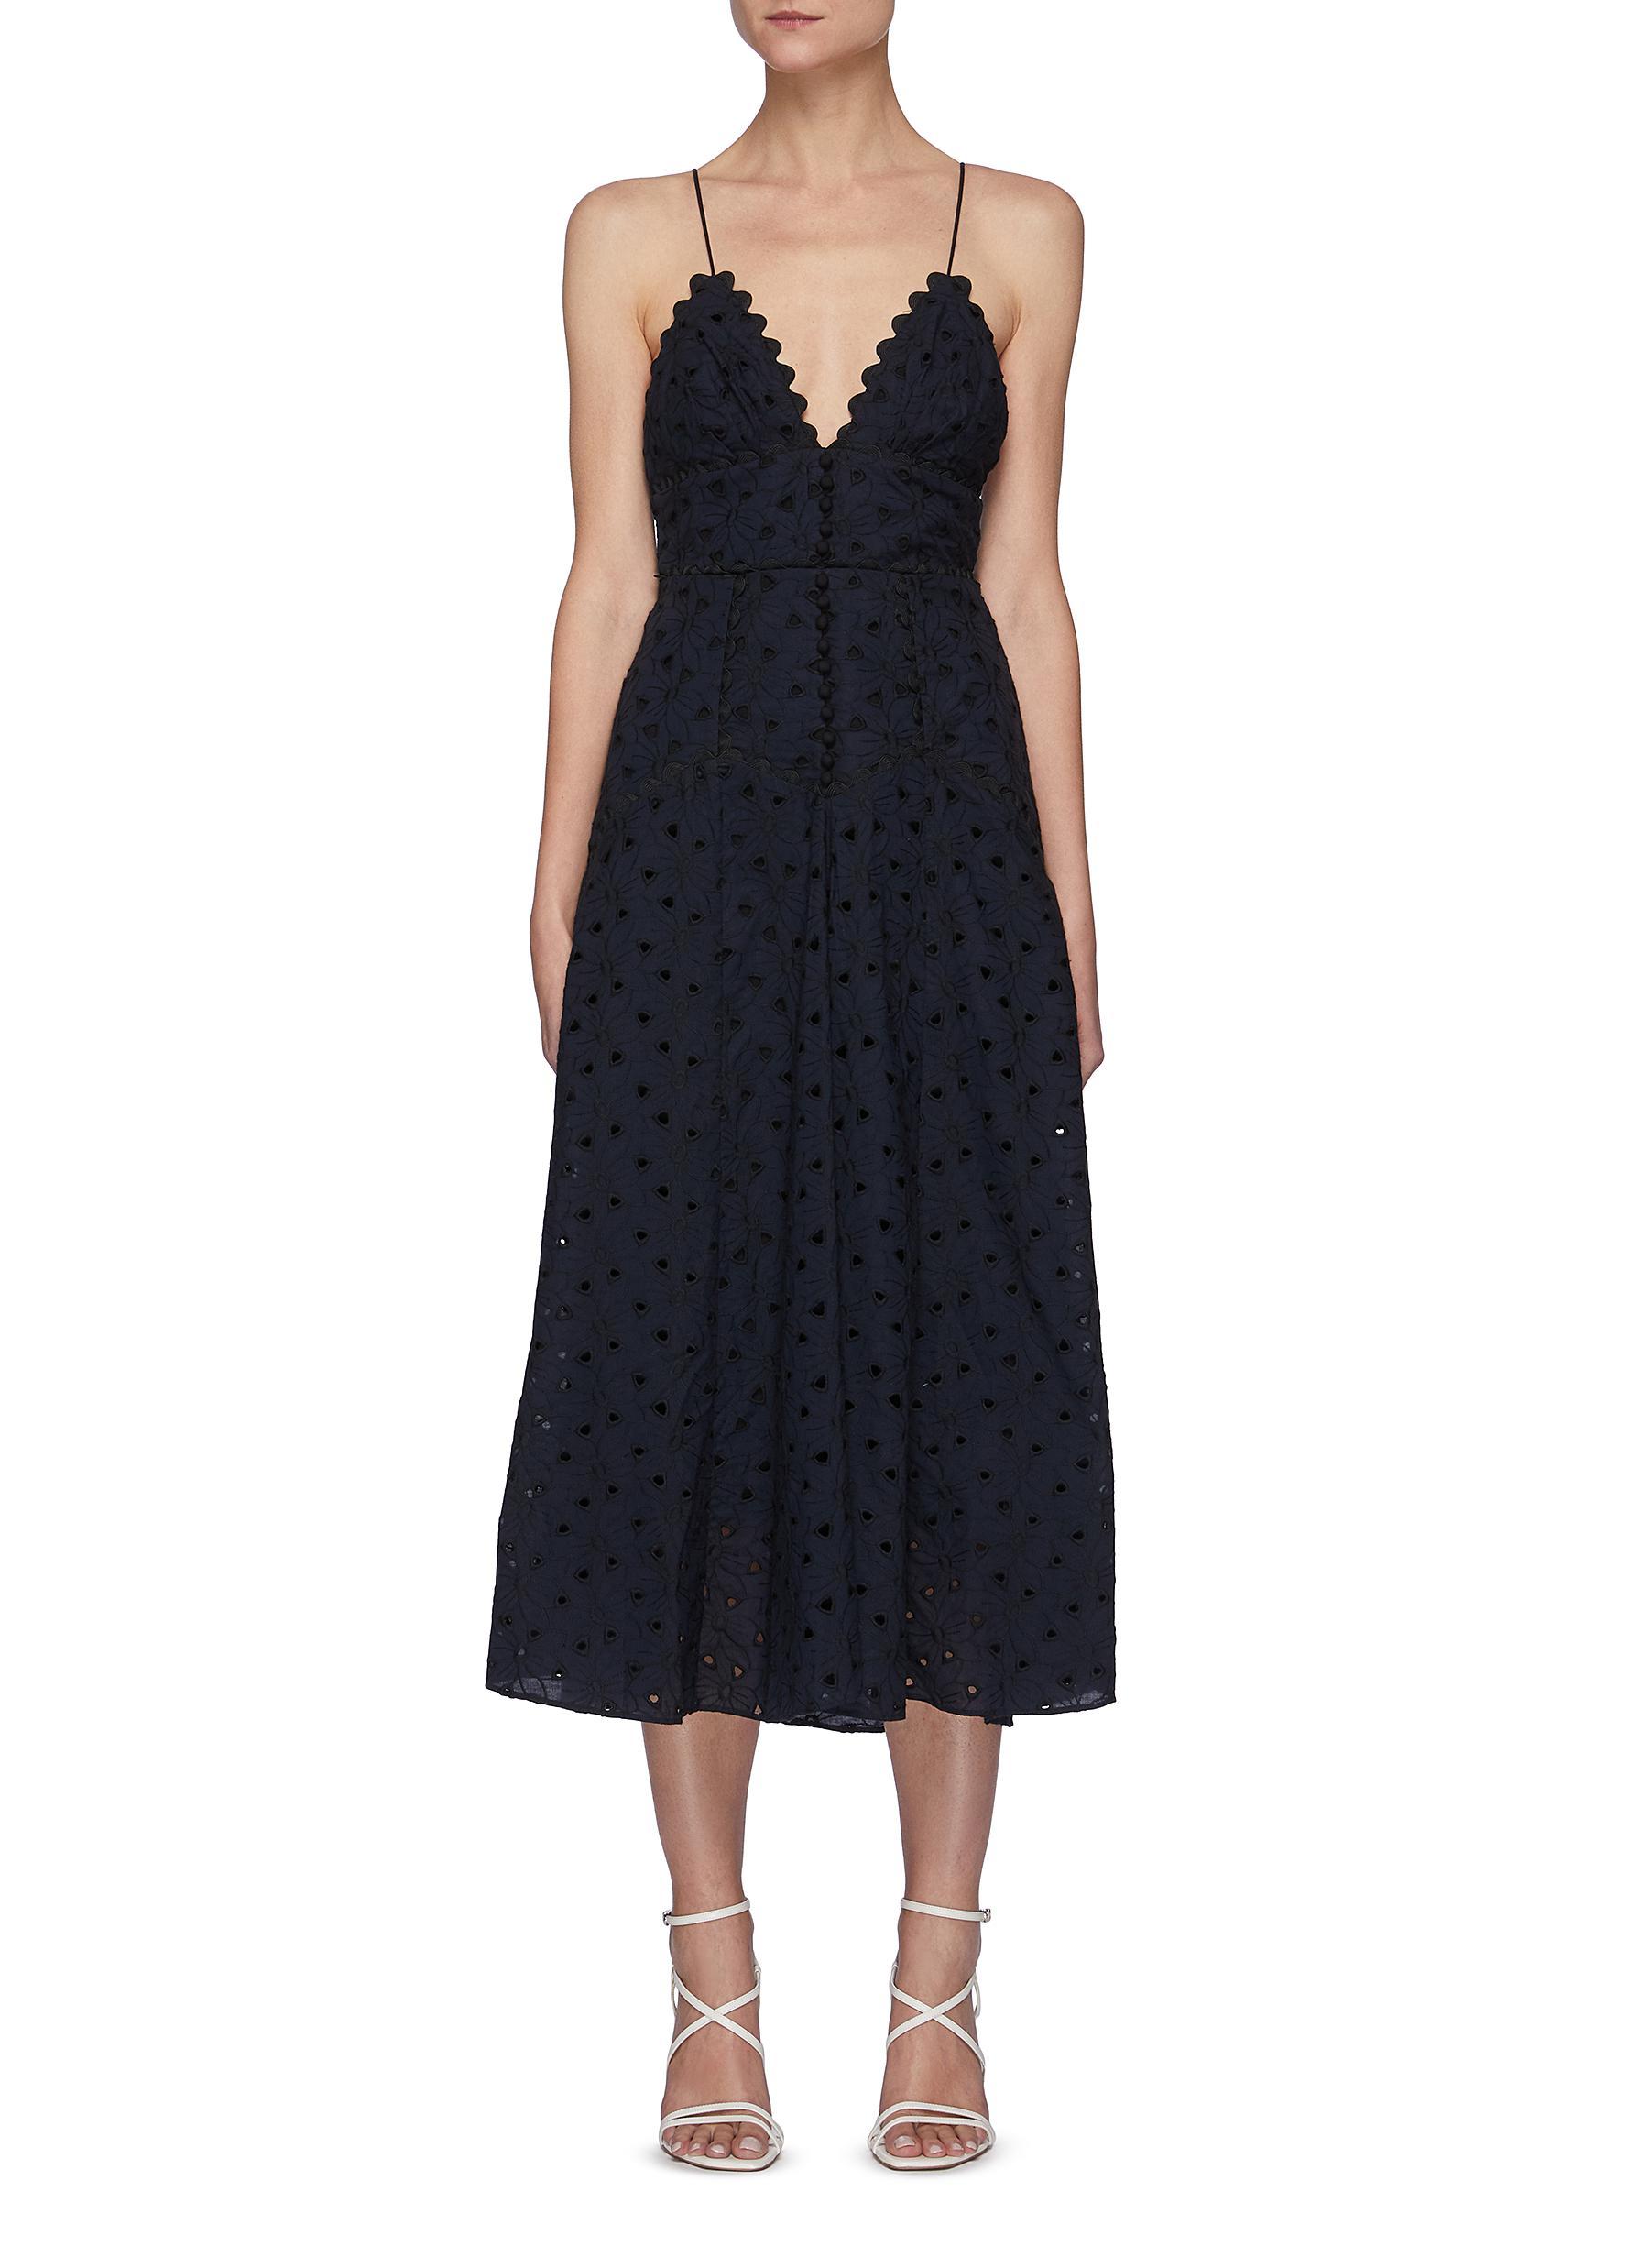 Stanton' Dress